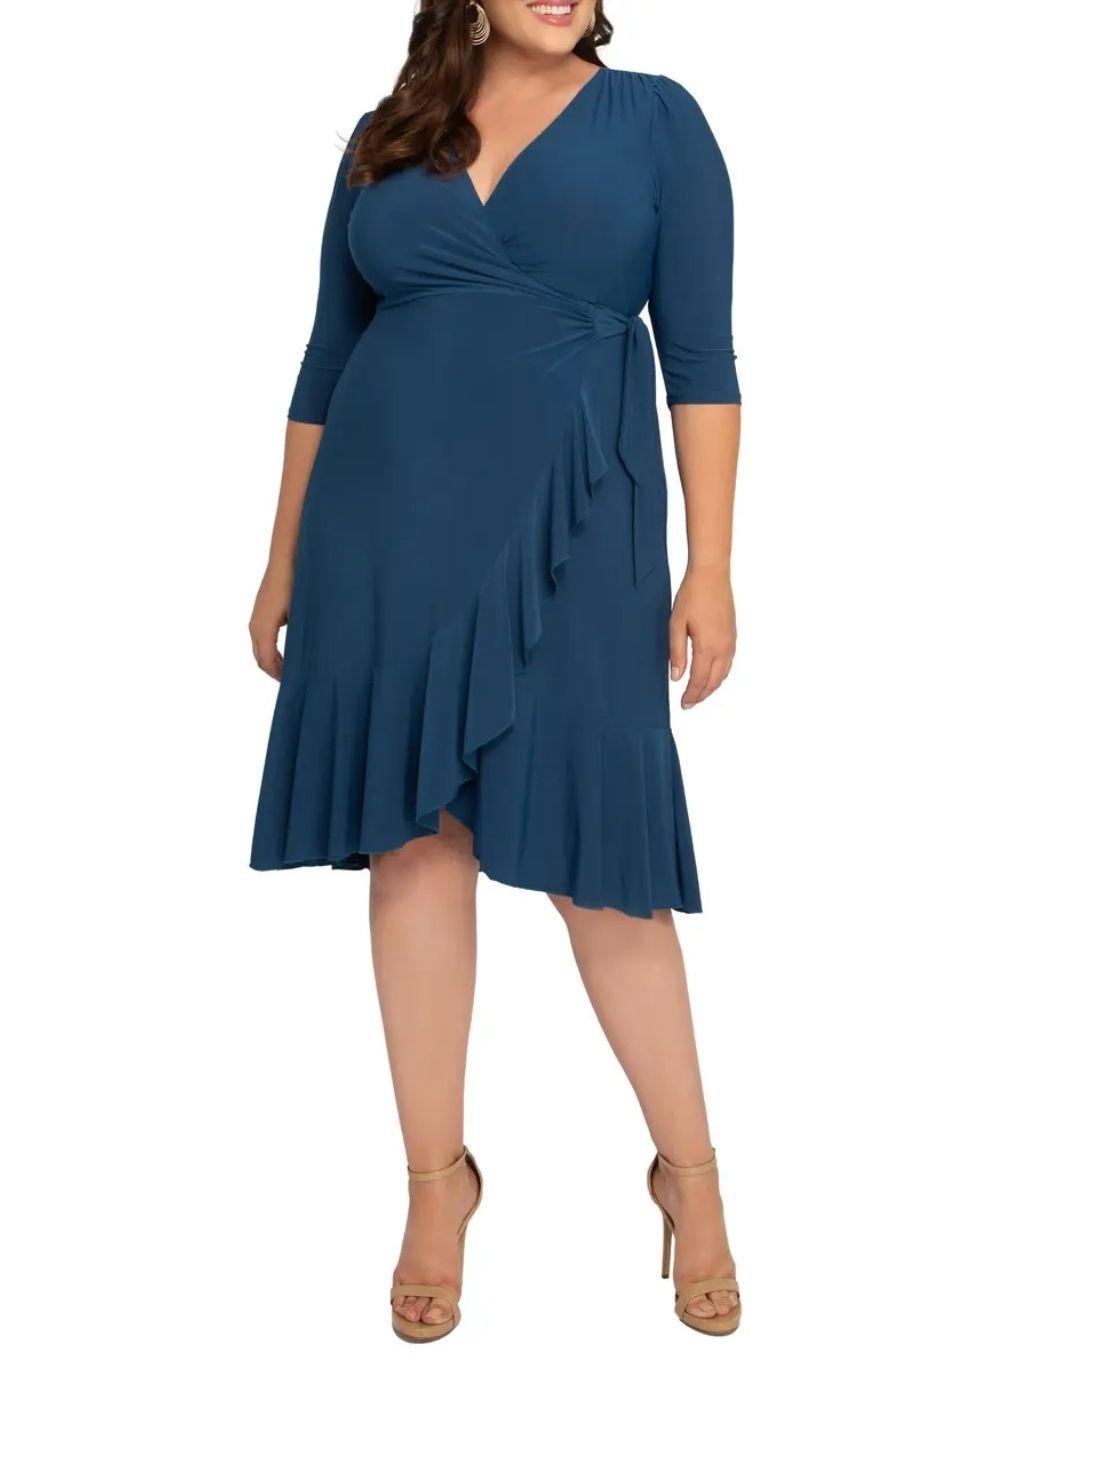 Wholesale Whimsy Wrap Dress